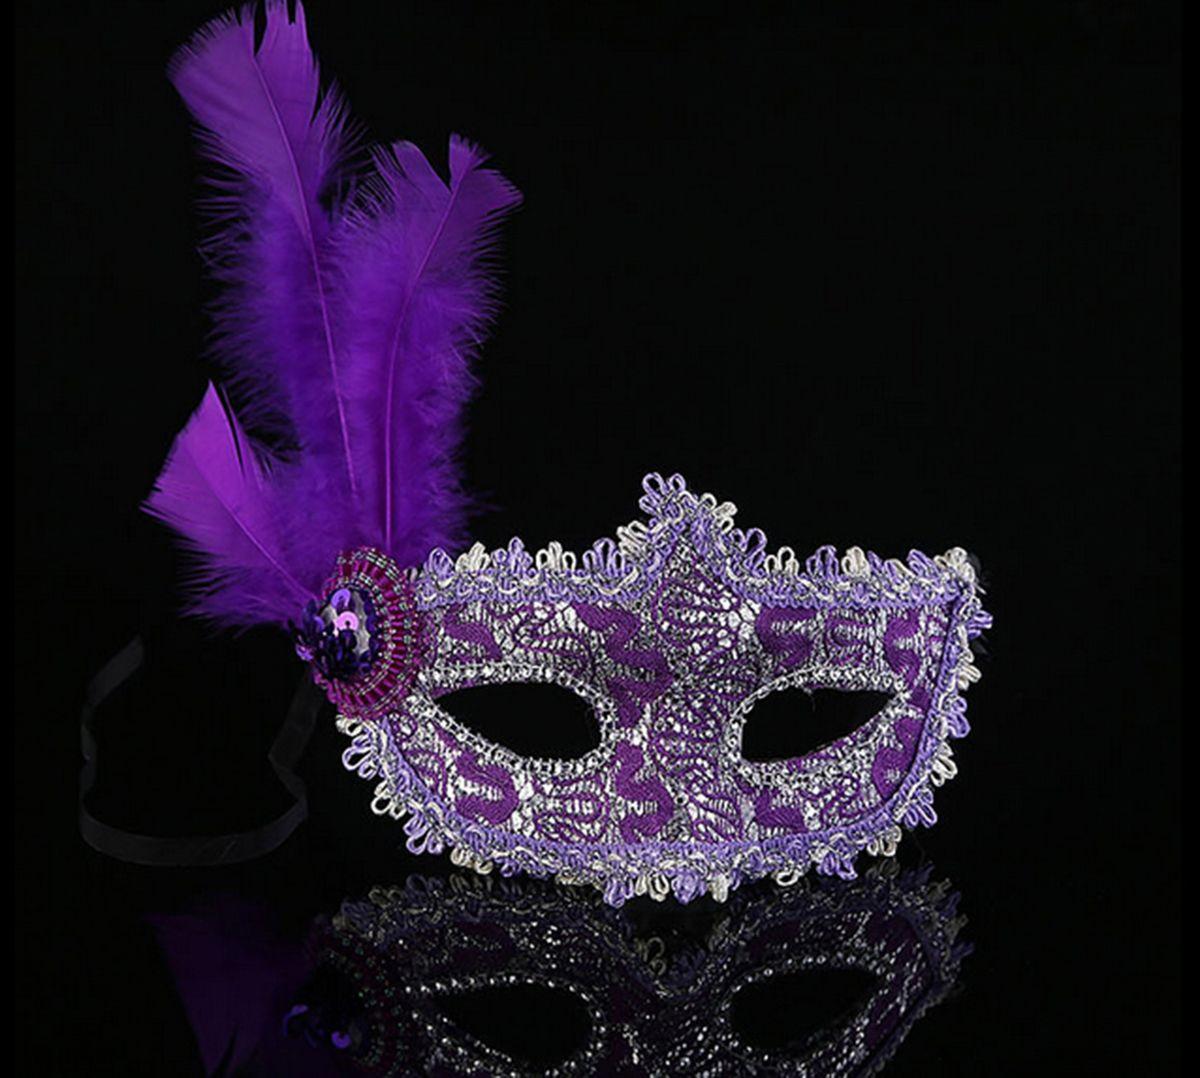 цена на Маска карнавальная Magic Time Фиолетовая с перьями. 41842